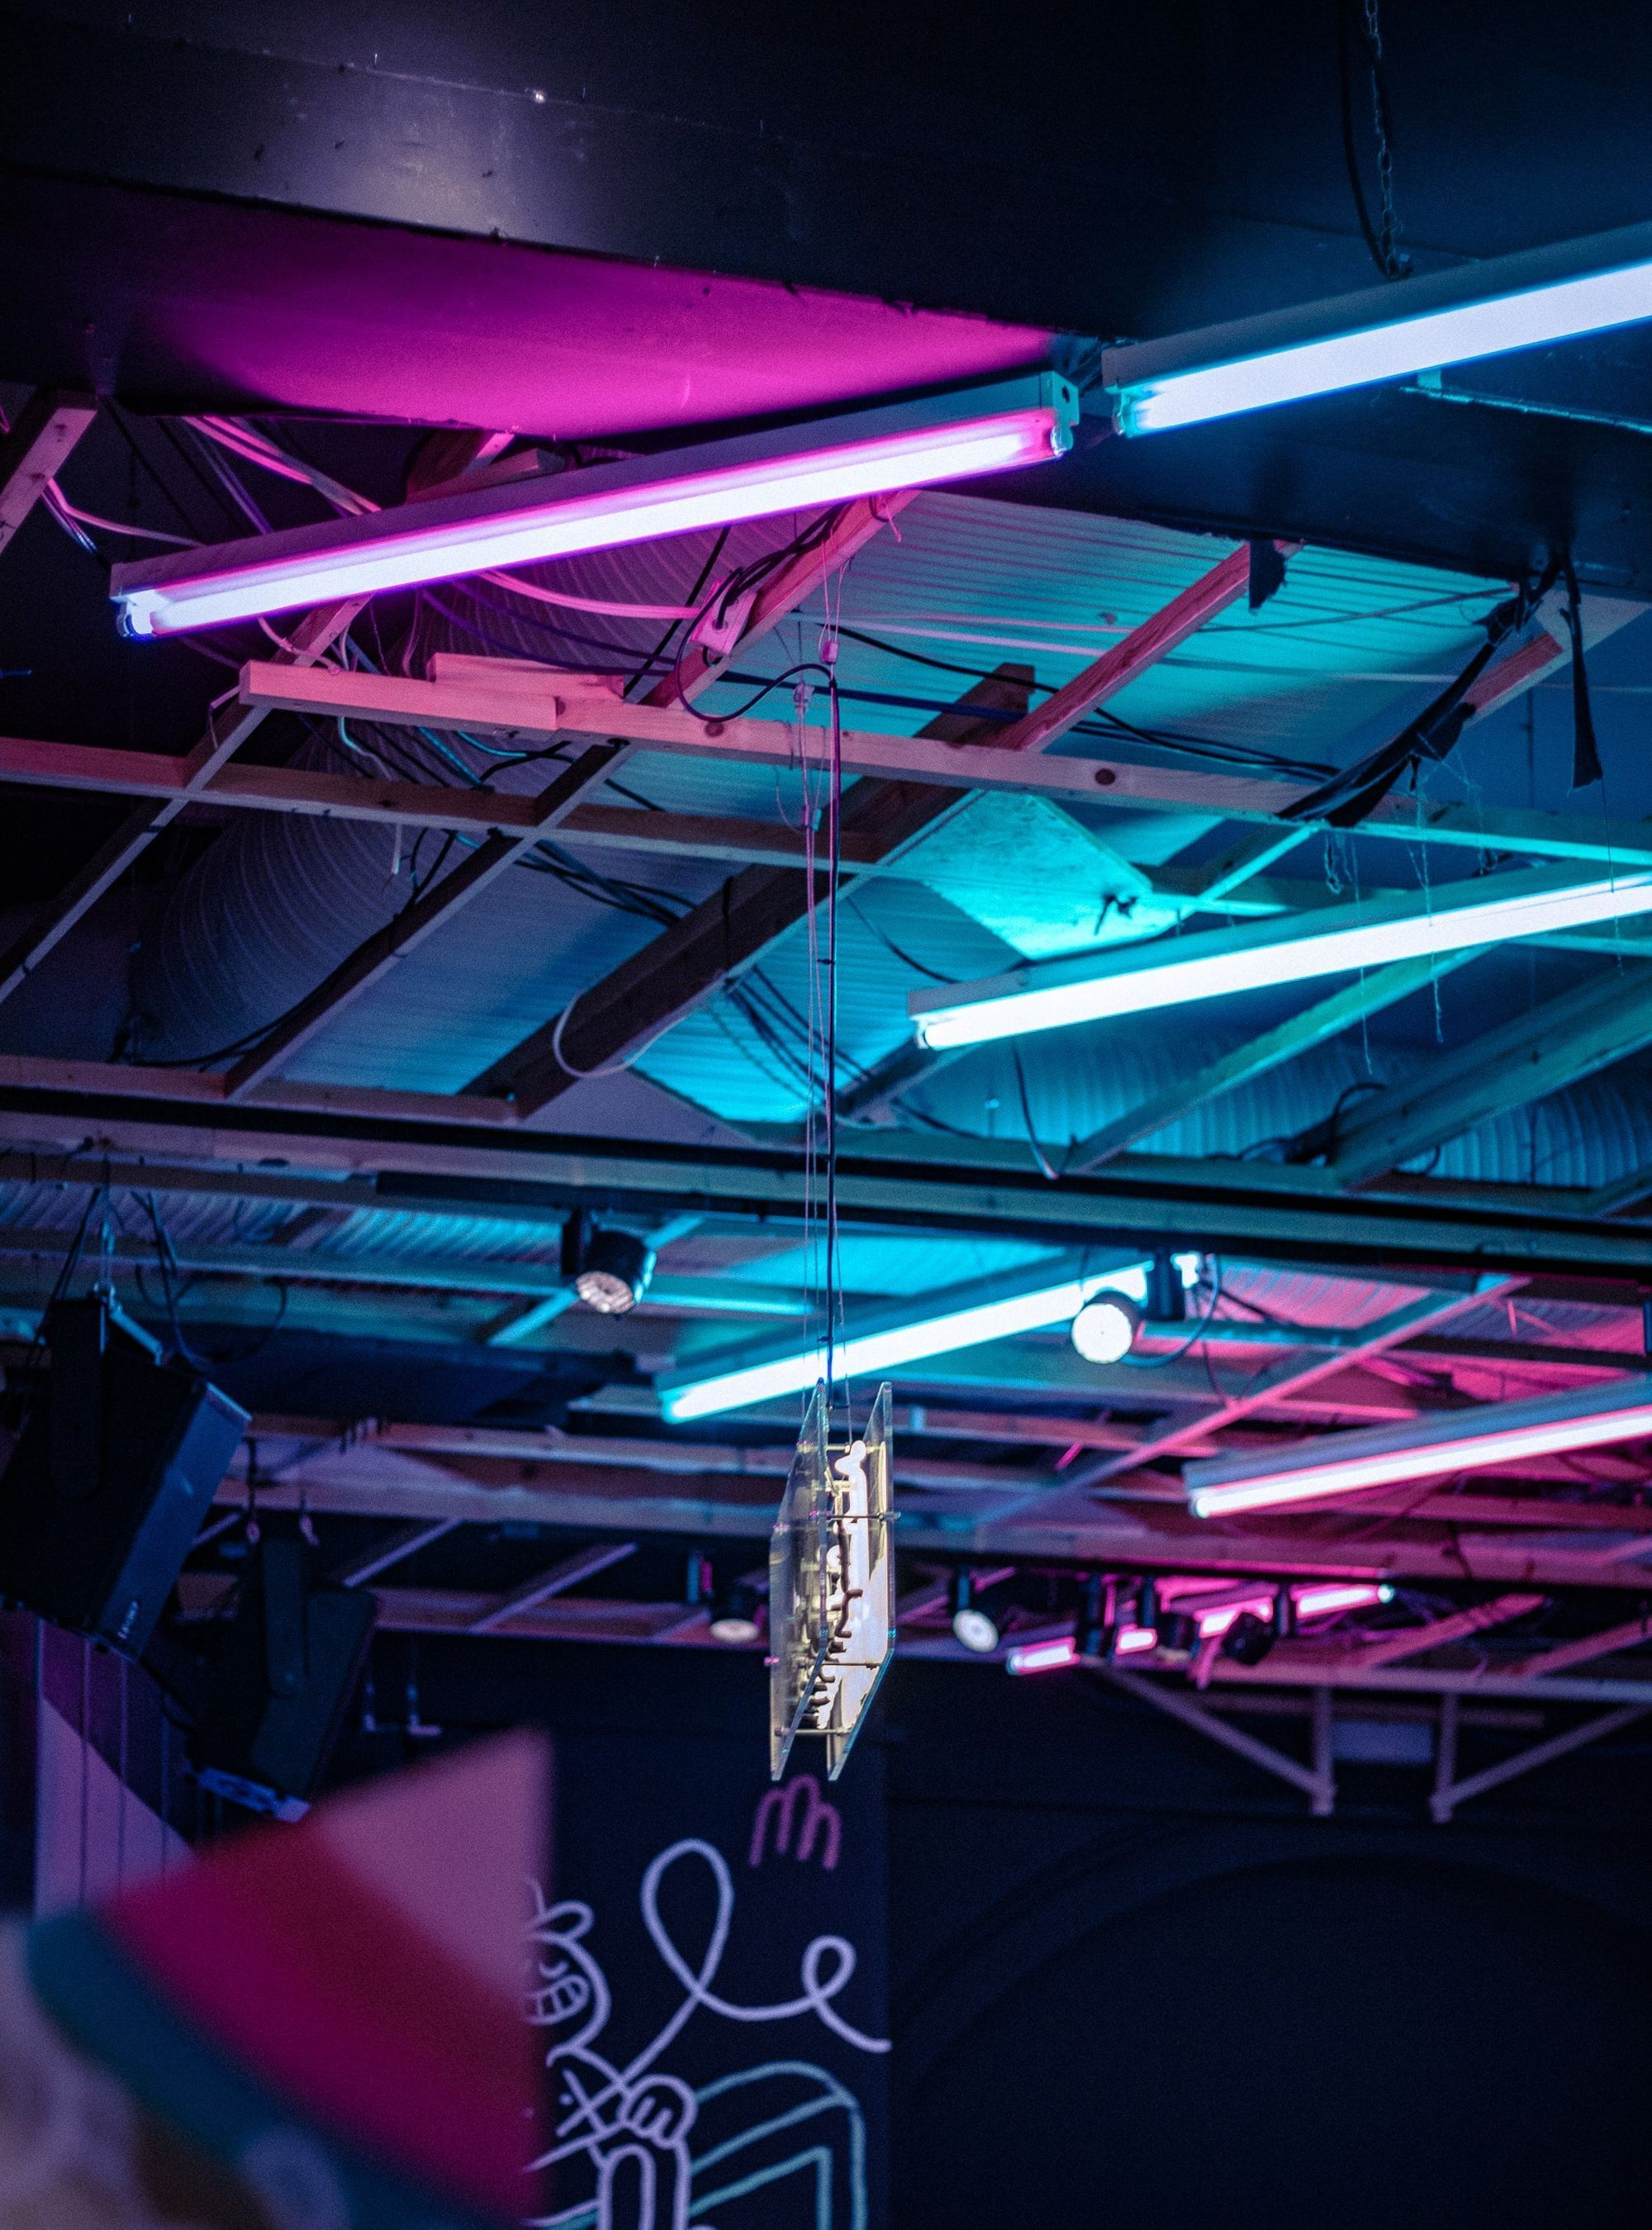 Fluorescent lighting equipment